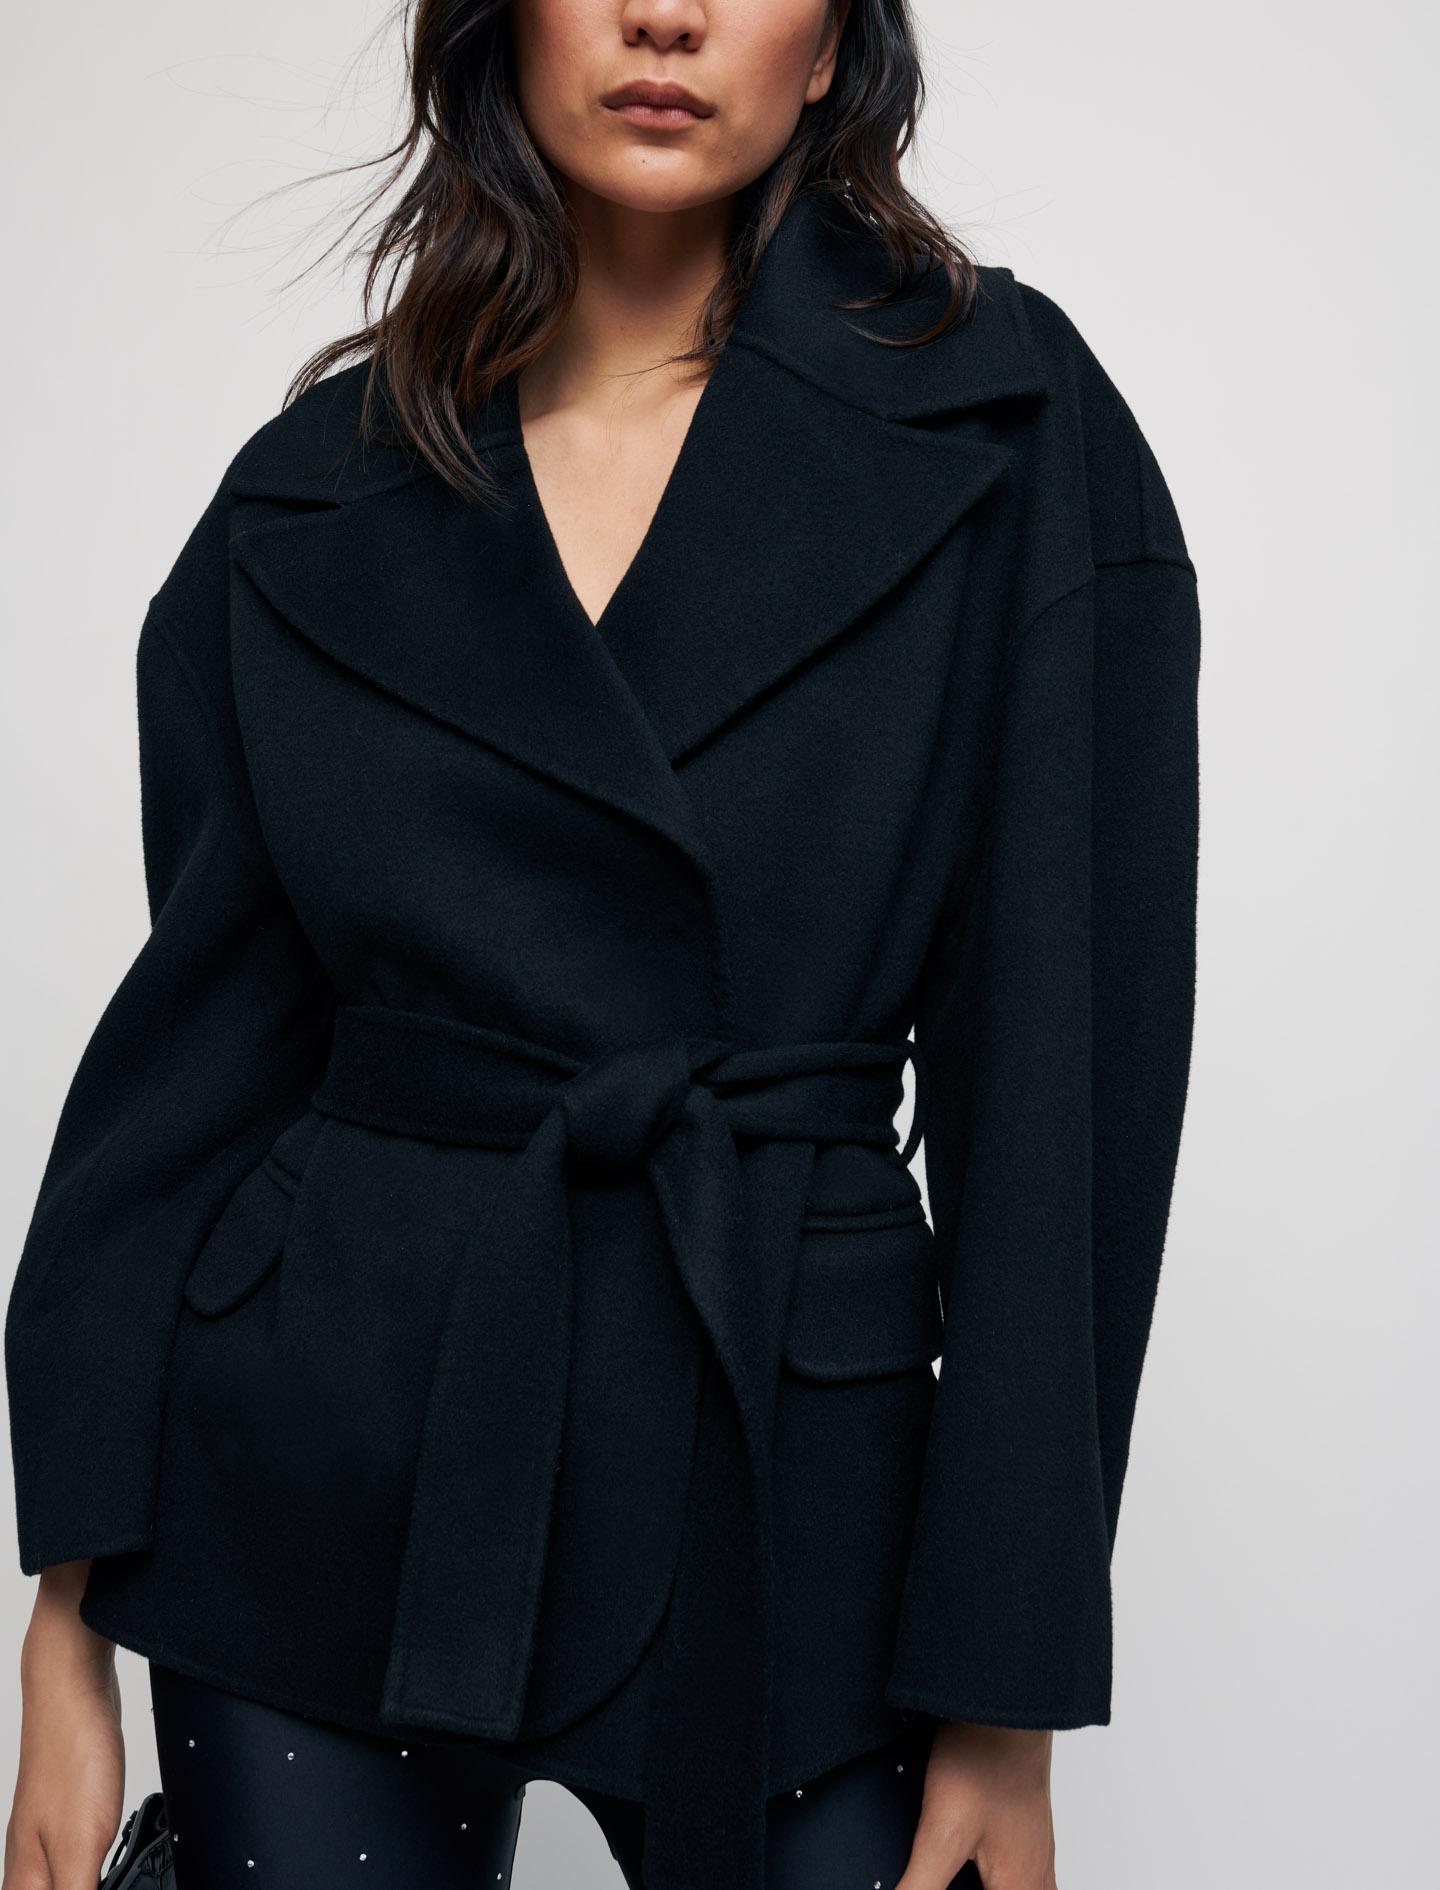 Double face wool blend coat with belt - Black